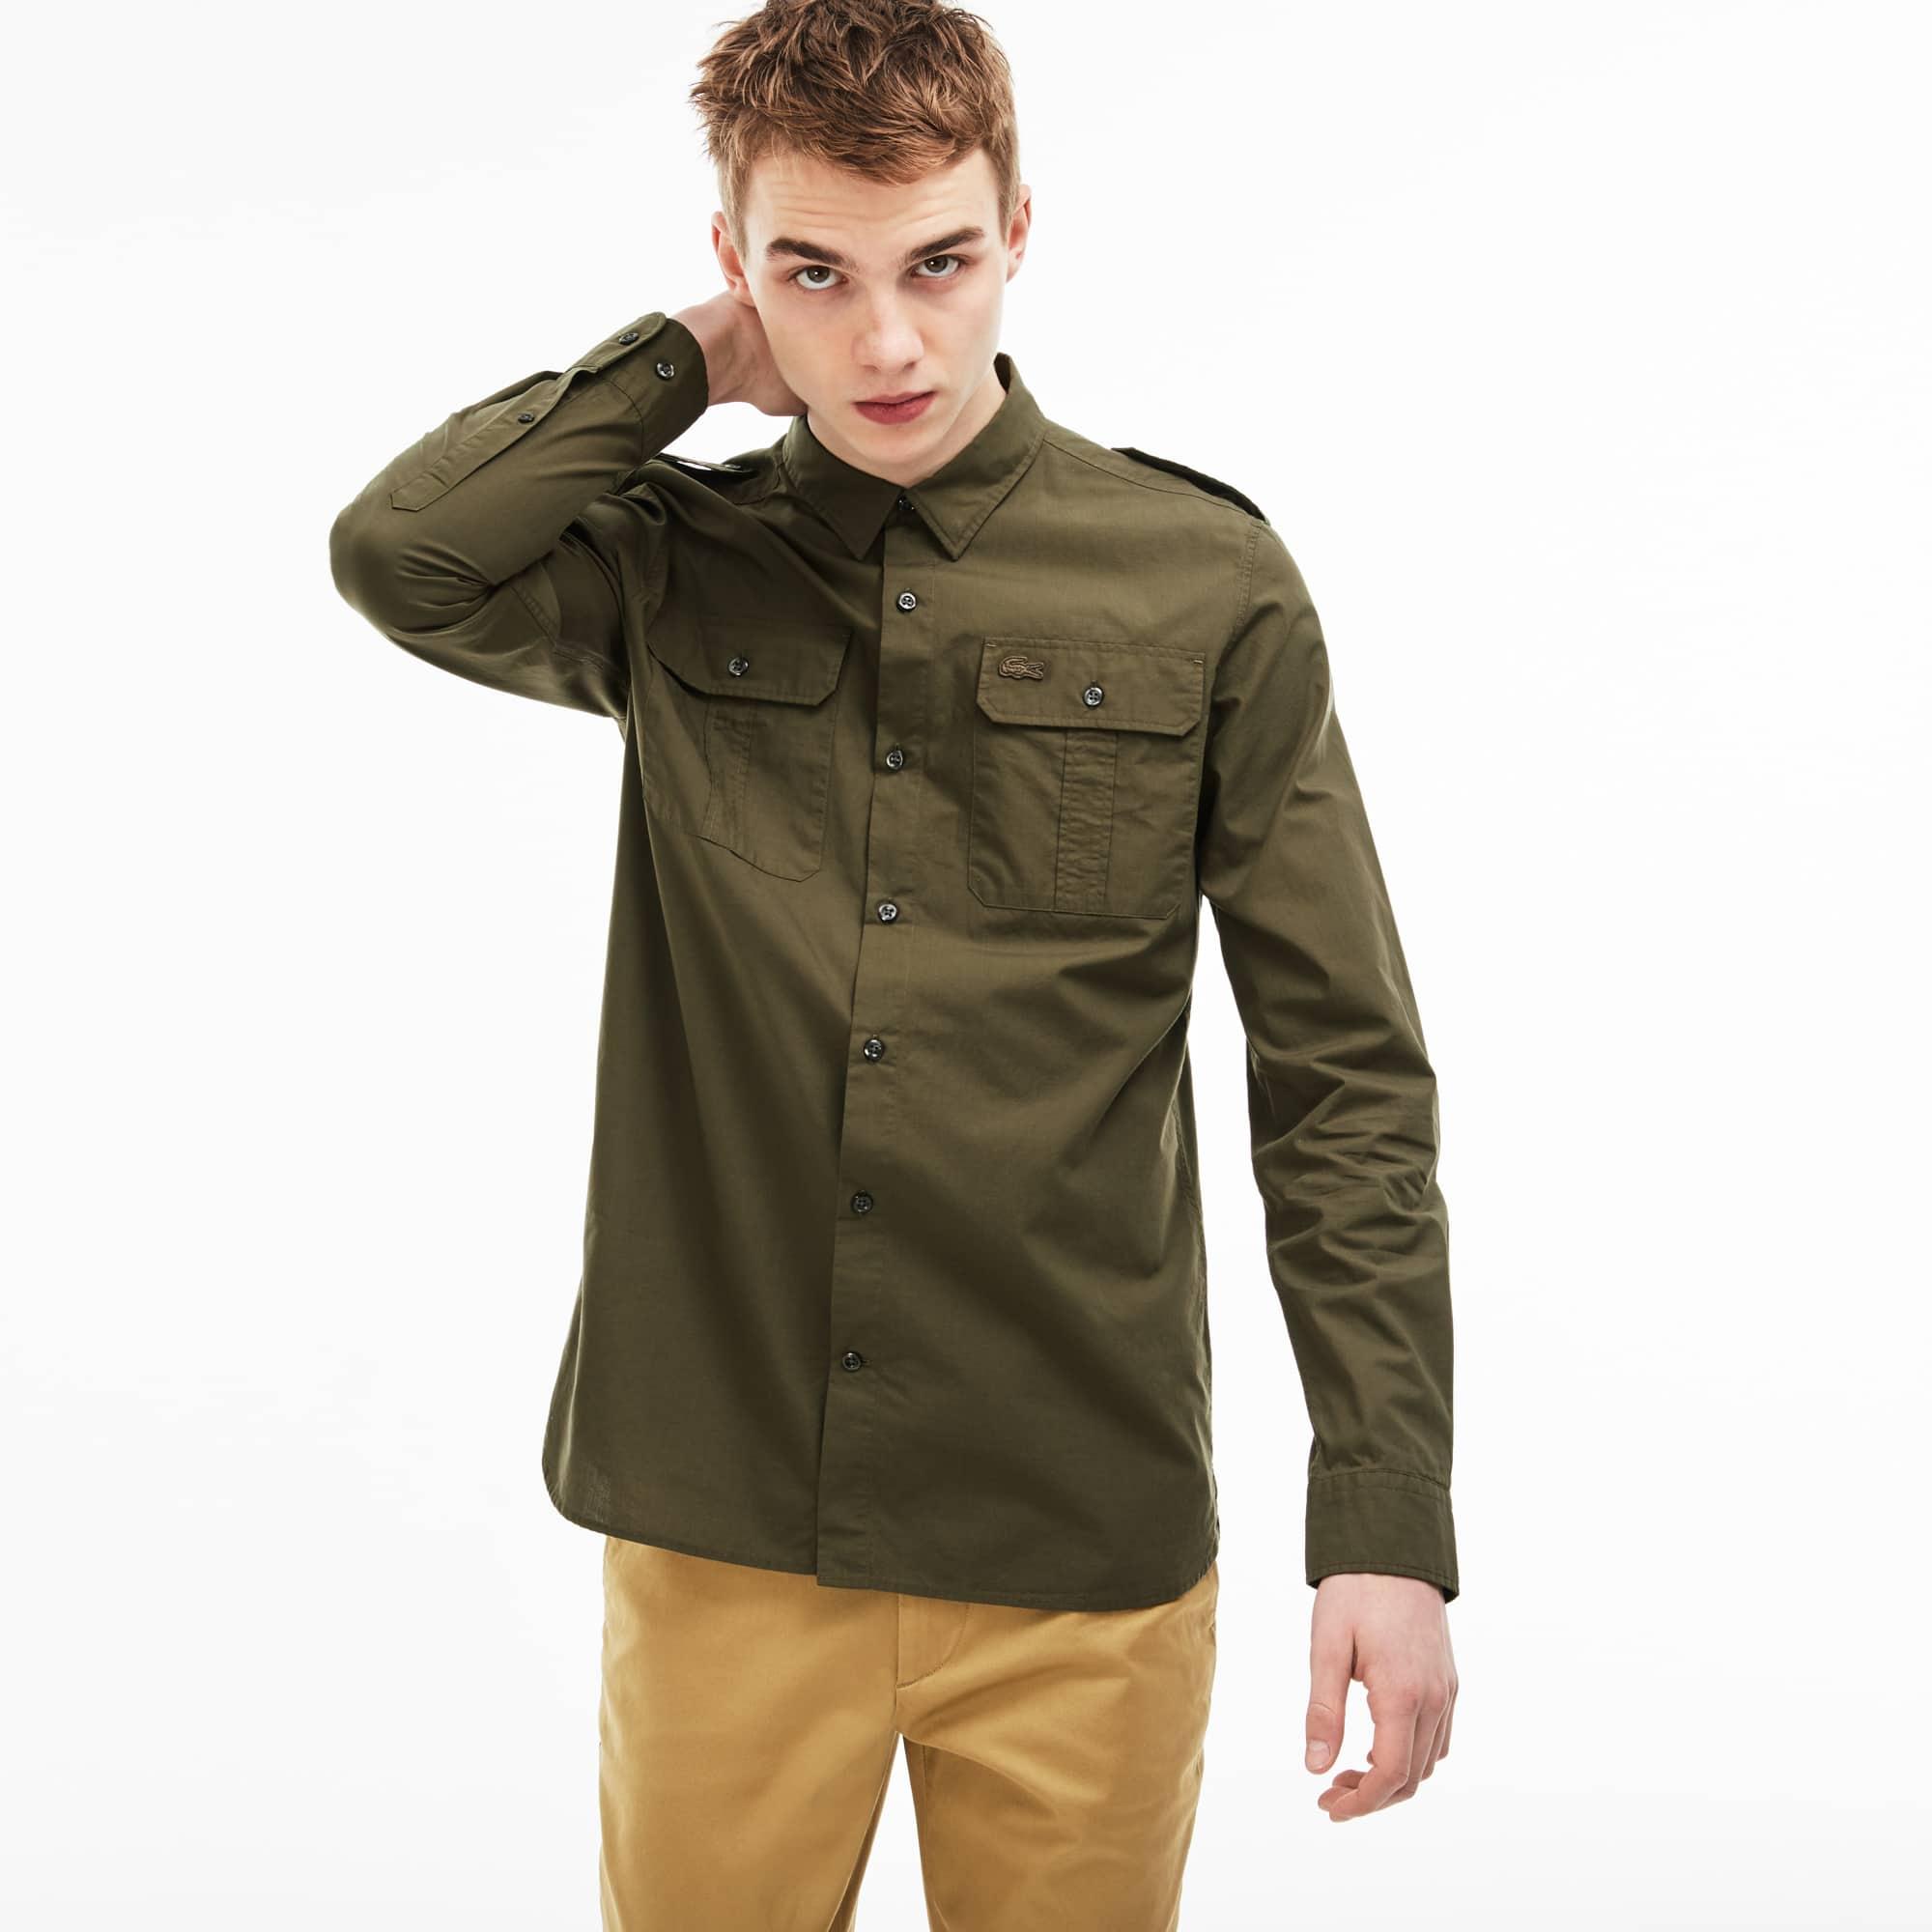 Men's Lacoste LIVE Skinny Fit Pockets Cotton Poplin Shirt